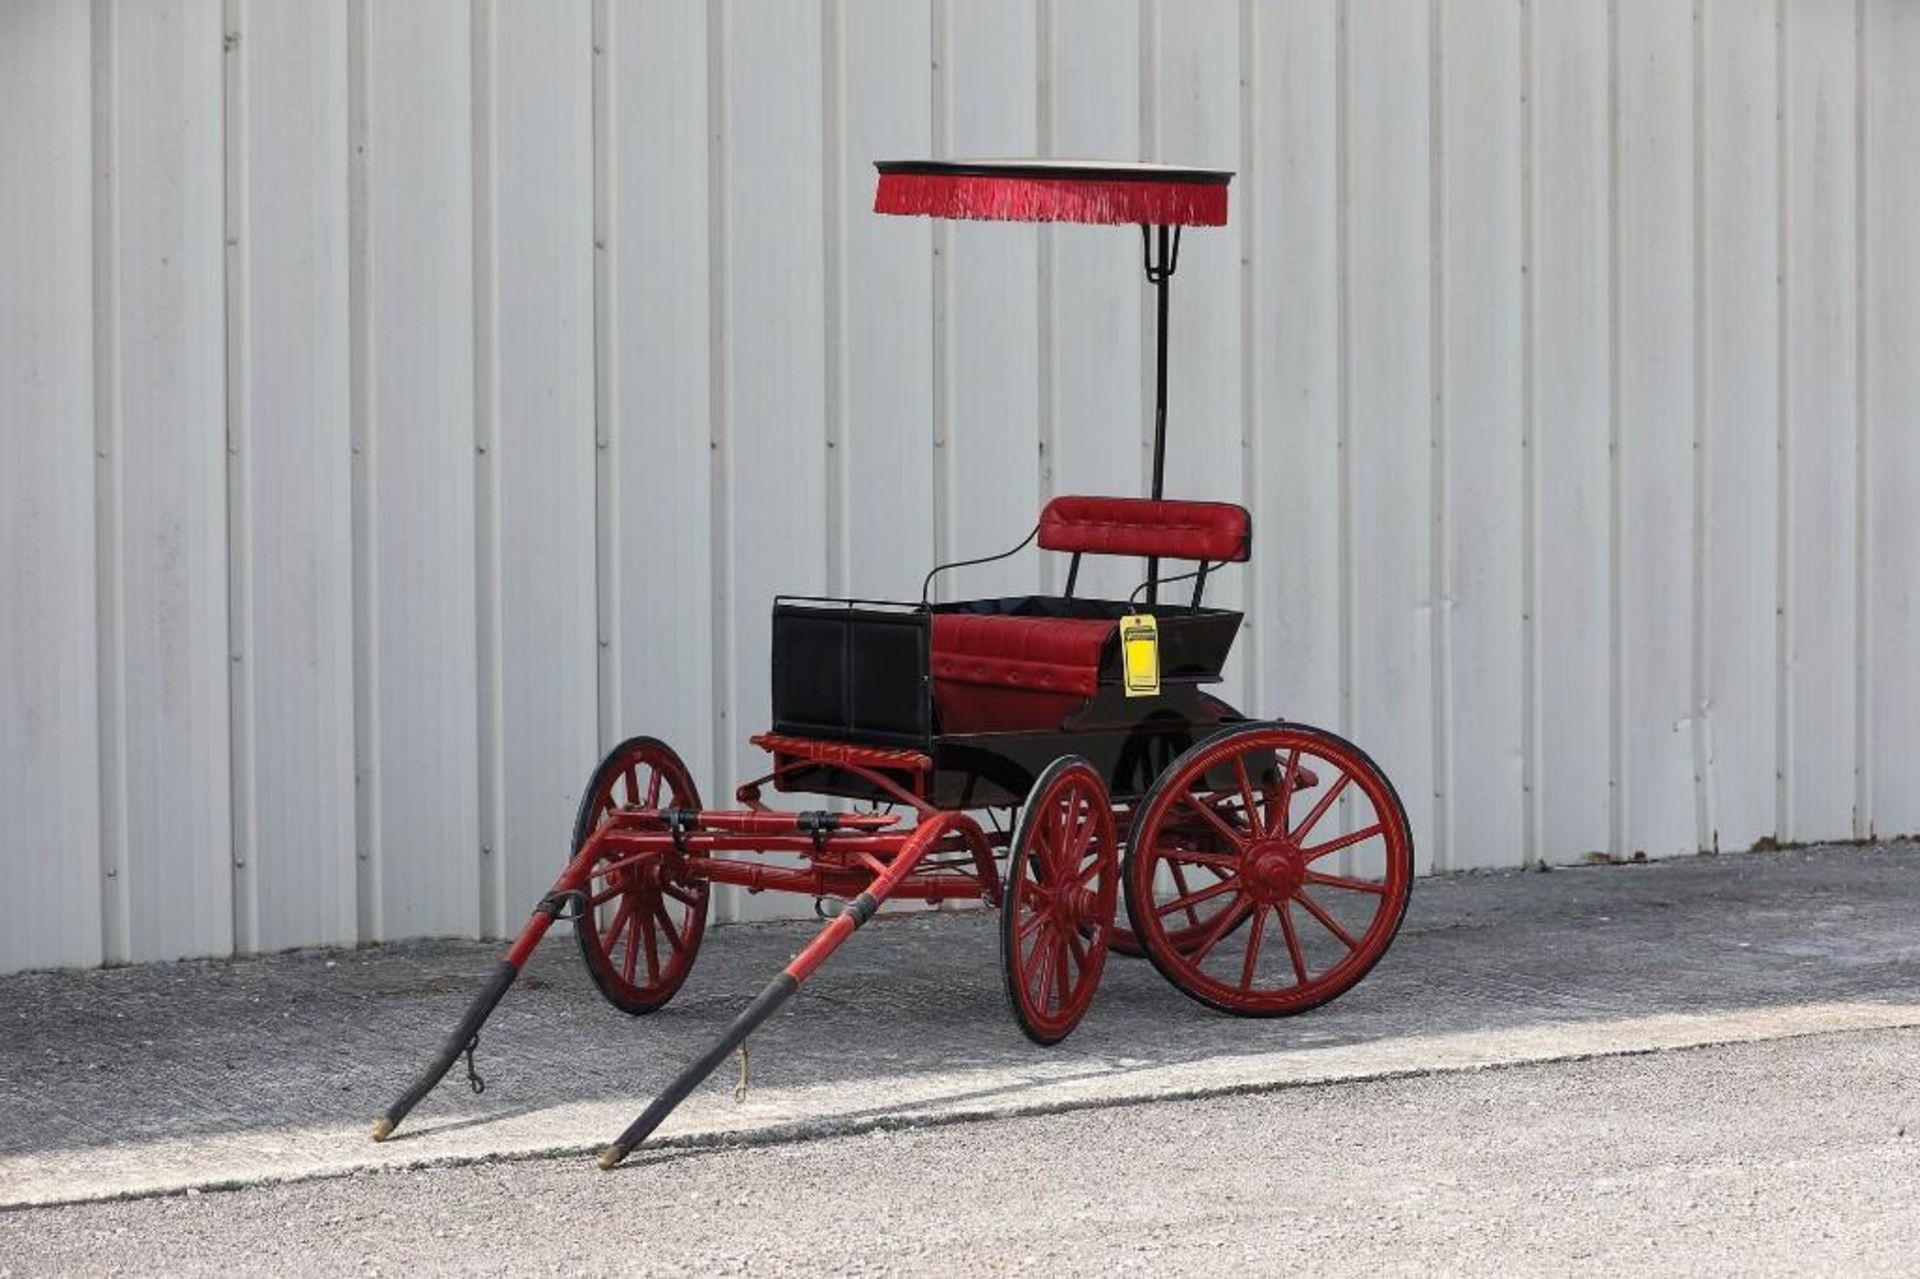 Miniature Pony Surrey, 4-Wheel Steer - Image 2 of 2